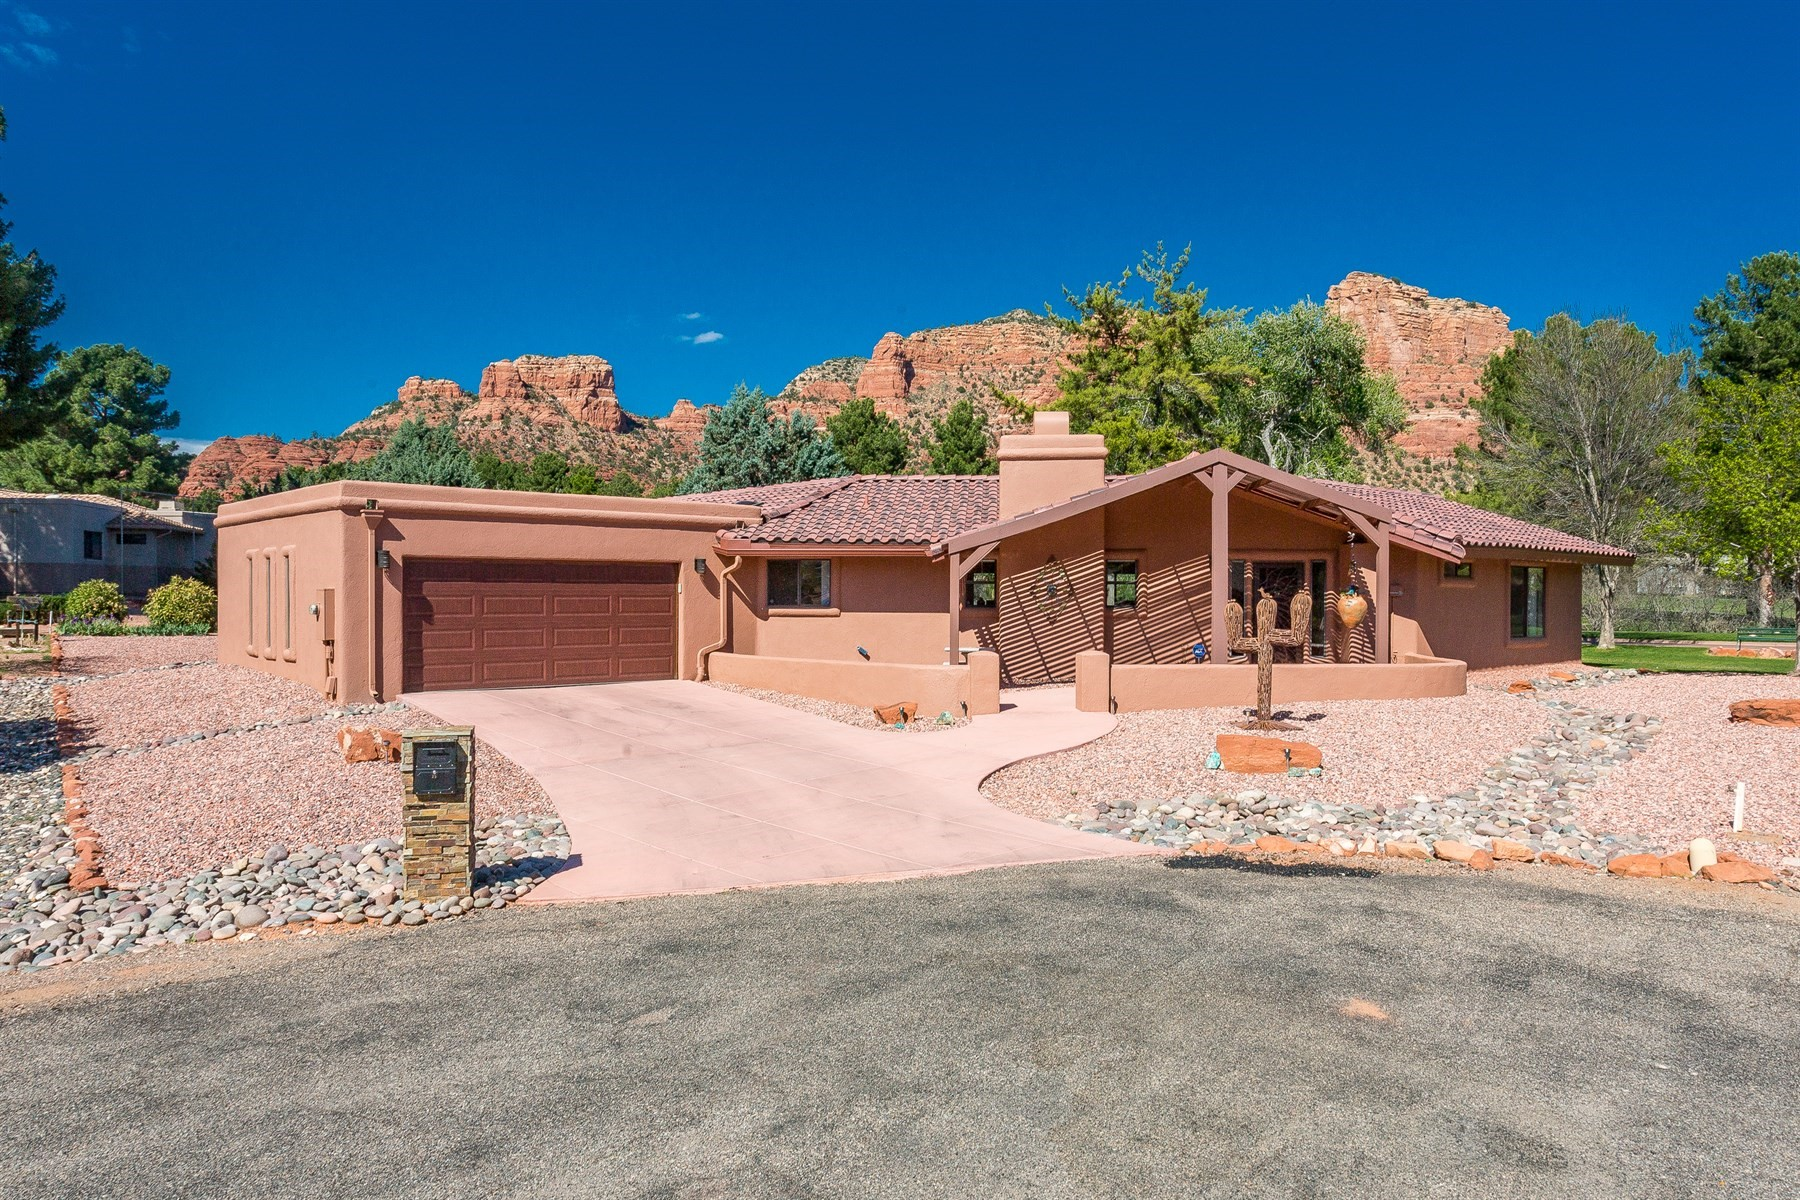 Casa para uma família para Venda às Charming home with unobstructed views 35 Vaquero Circle Sedona, Arizona, 86351 Estados Unidos